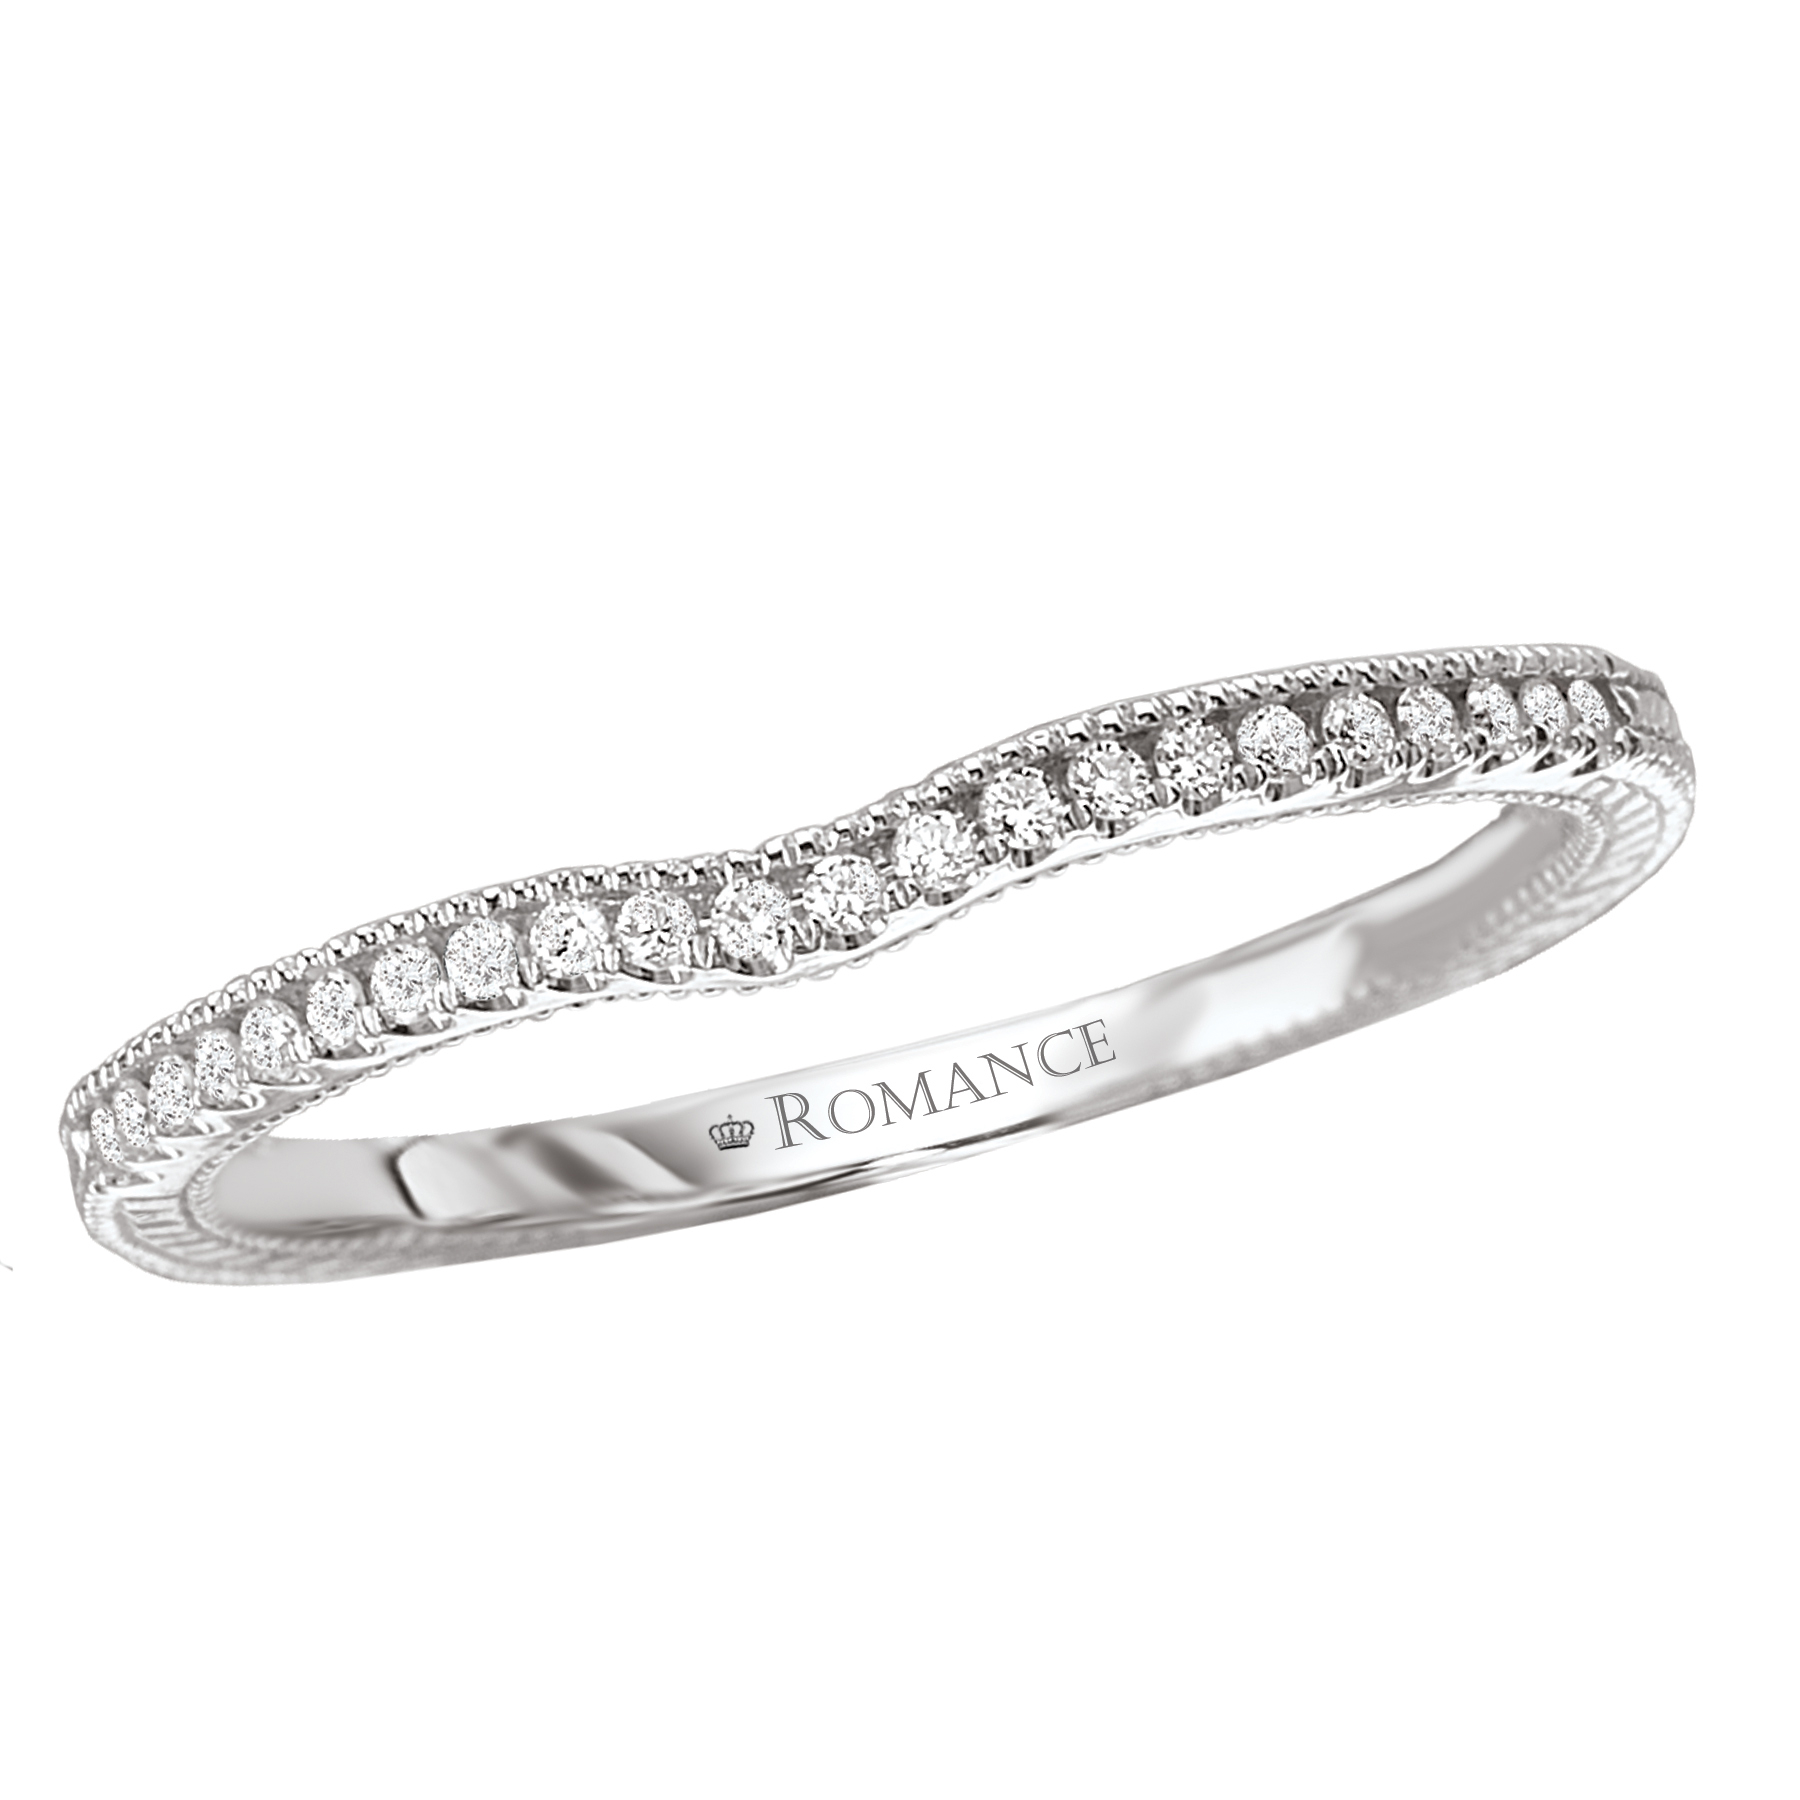 Romance Wedding Bands 118187-W product image